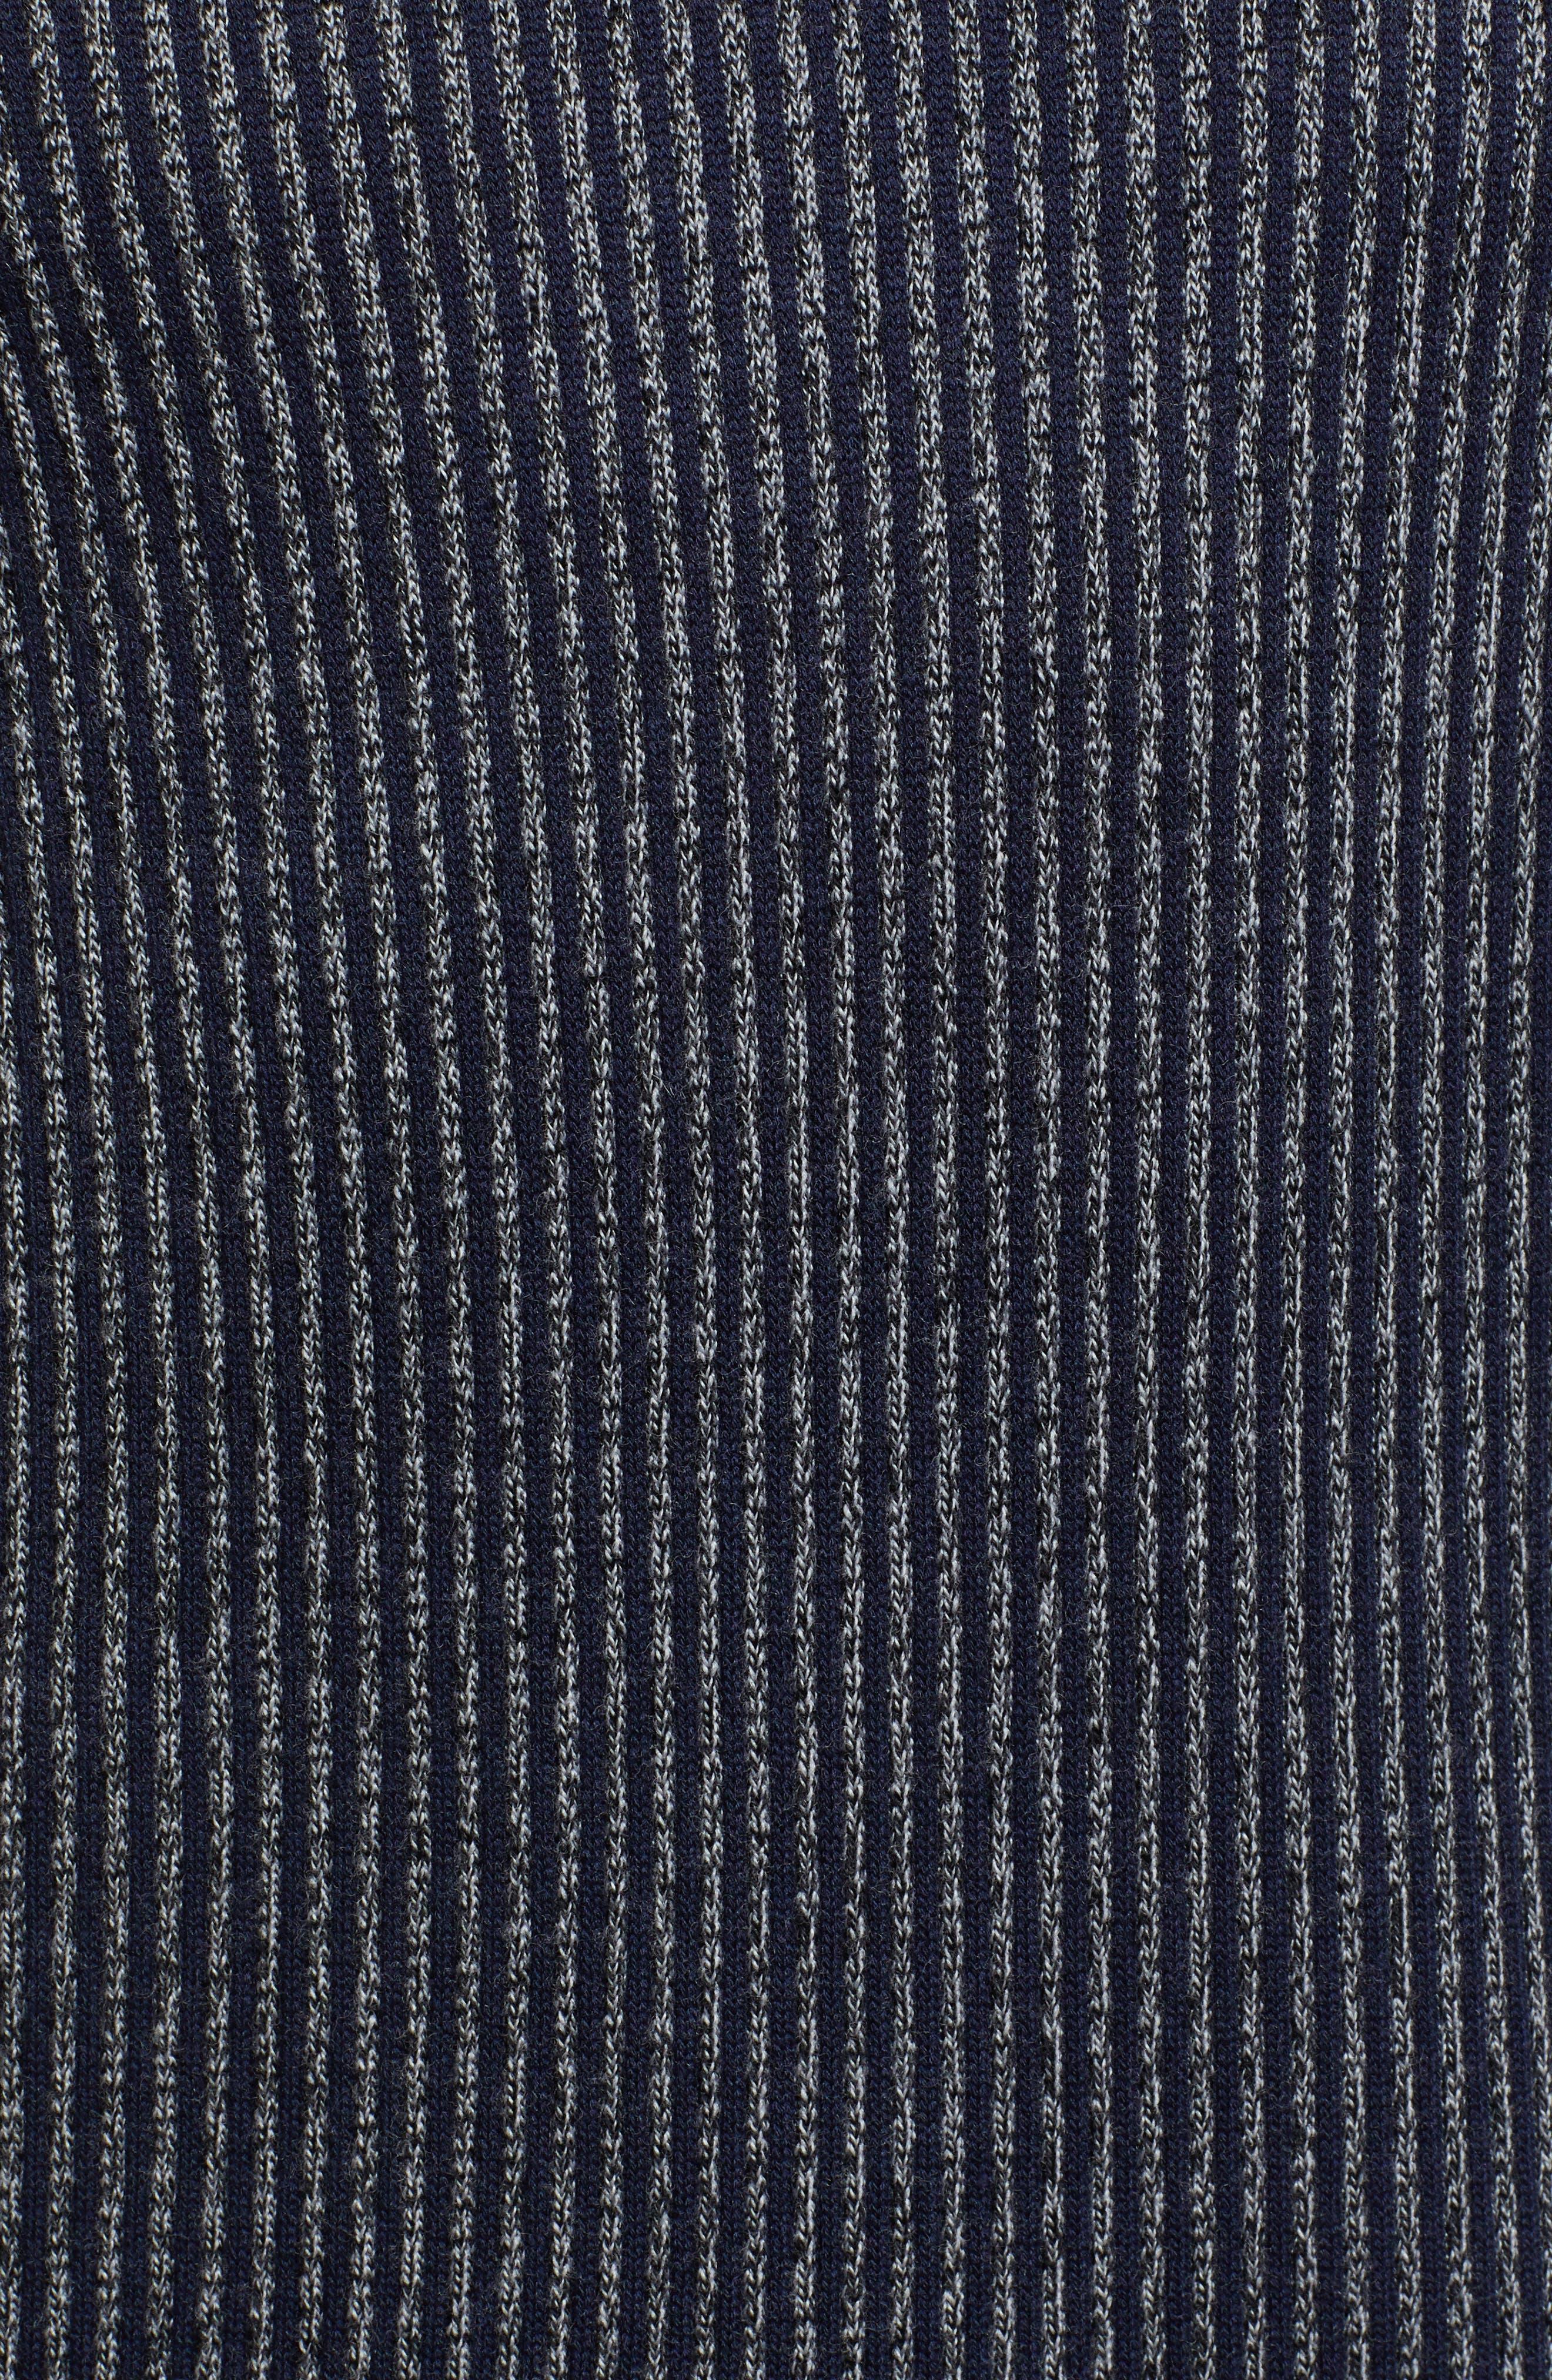 Jinxitt Crewneck Sweater,                             Alternate thumbnail 5, color,                             NAVY